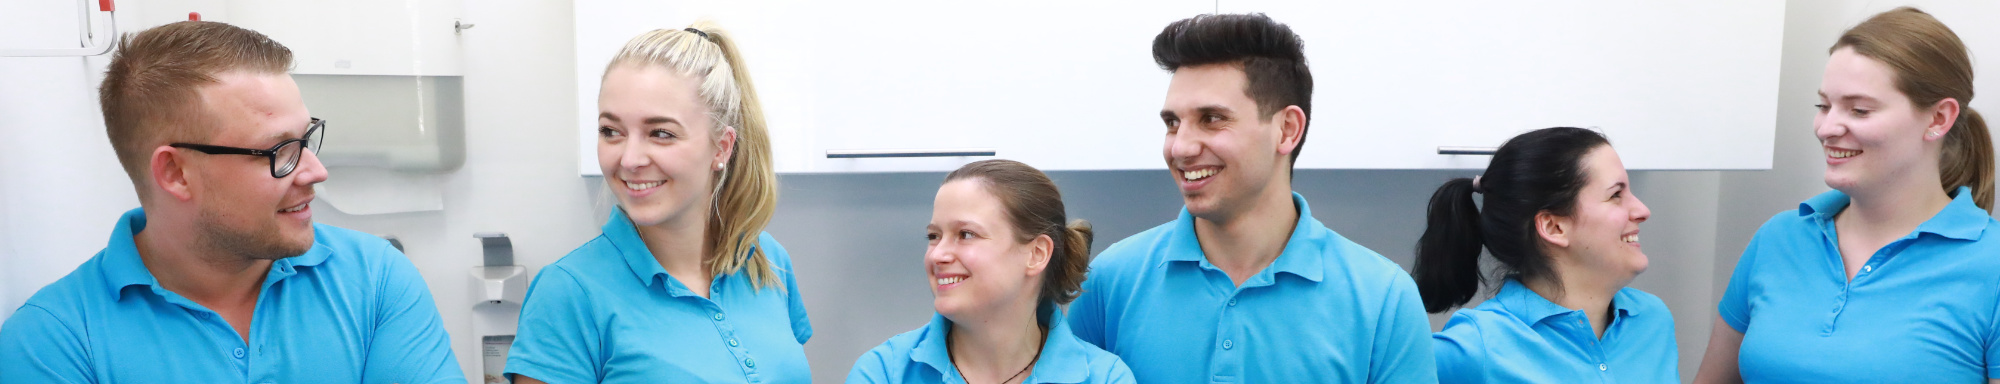 Jobs Bewerbung Zahnarztpraxis Endodontie Parodontologie CMD-Hamburg Dr Gerdes Kollegen